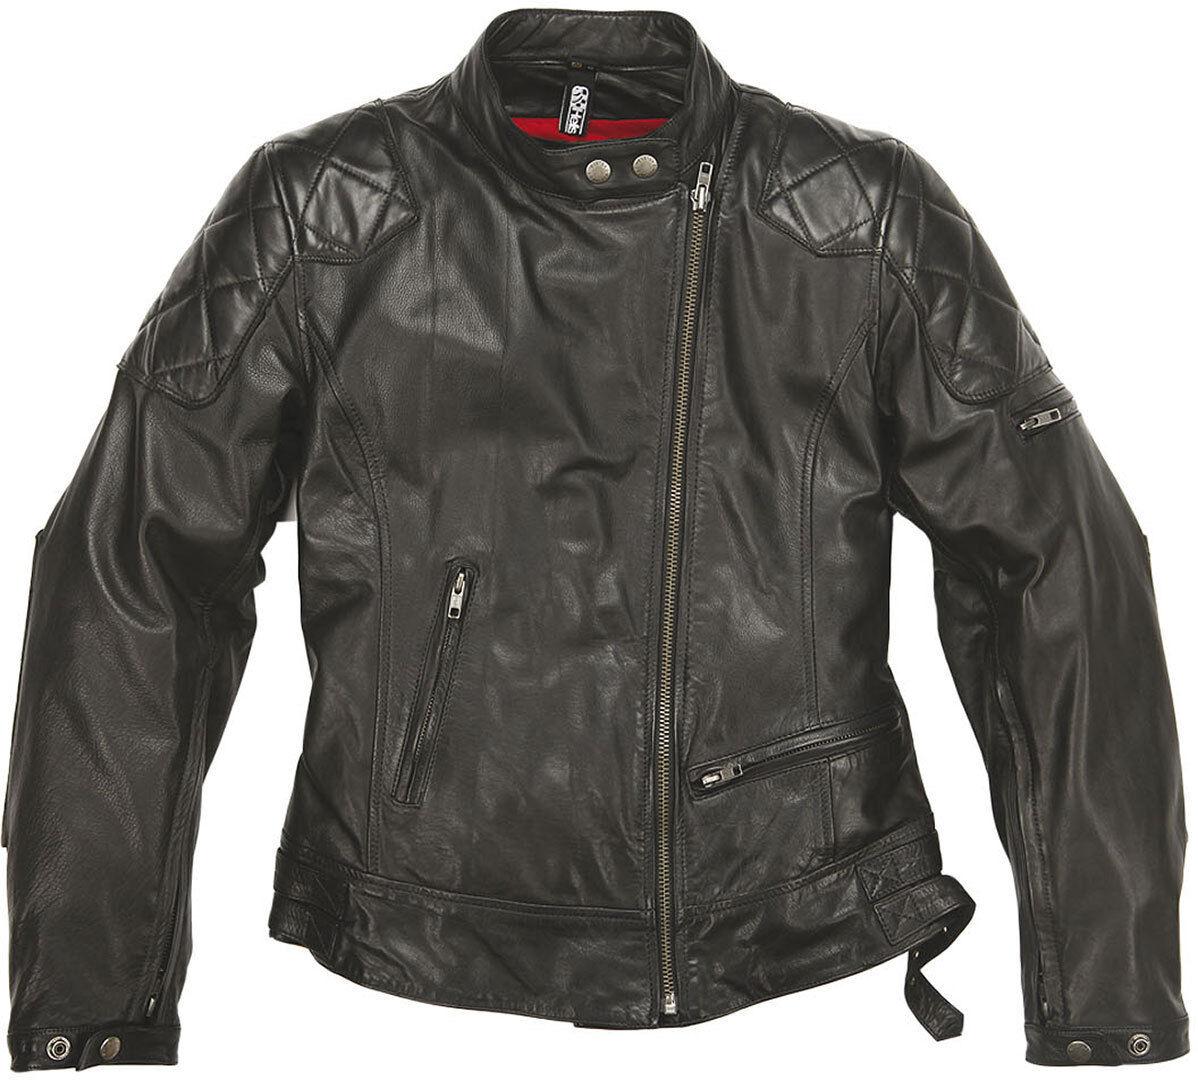 Helstons KS 70 Veste en cuir de dames Noir taille : XL